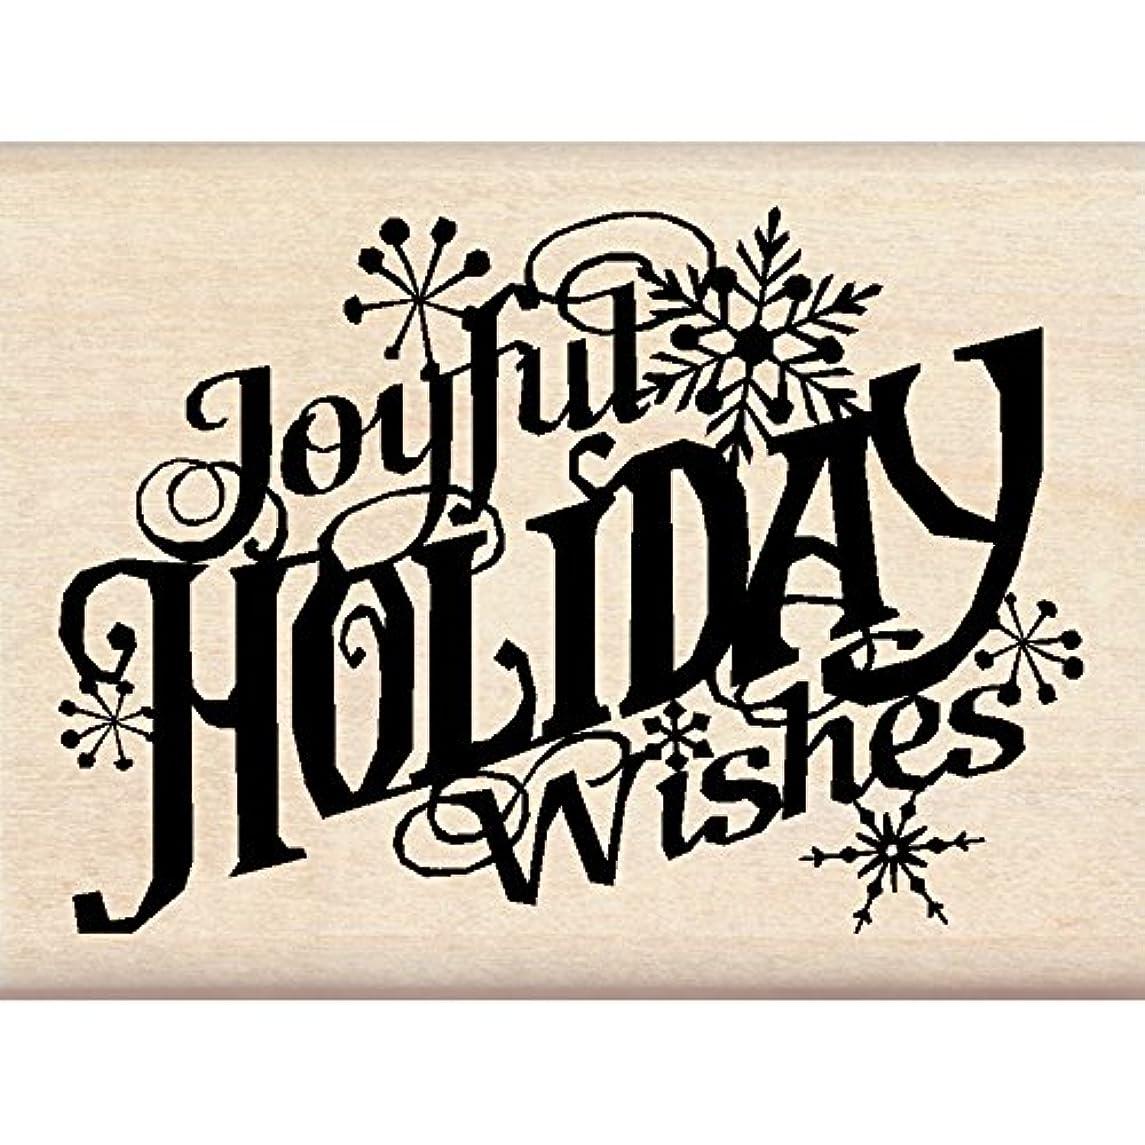 Inkadinkado Christmas Mounted Rubber Stamp, 3 by 2.25-Inch, Joyful Holiday Wishes